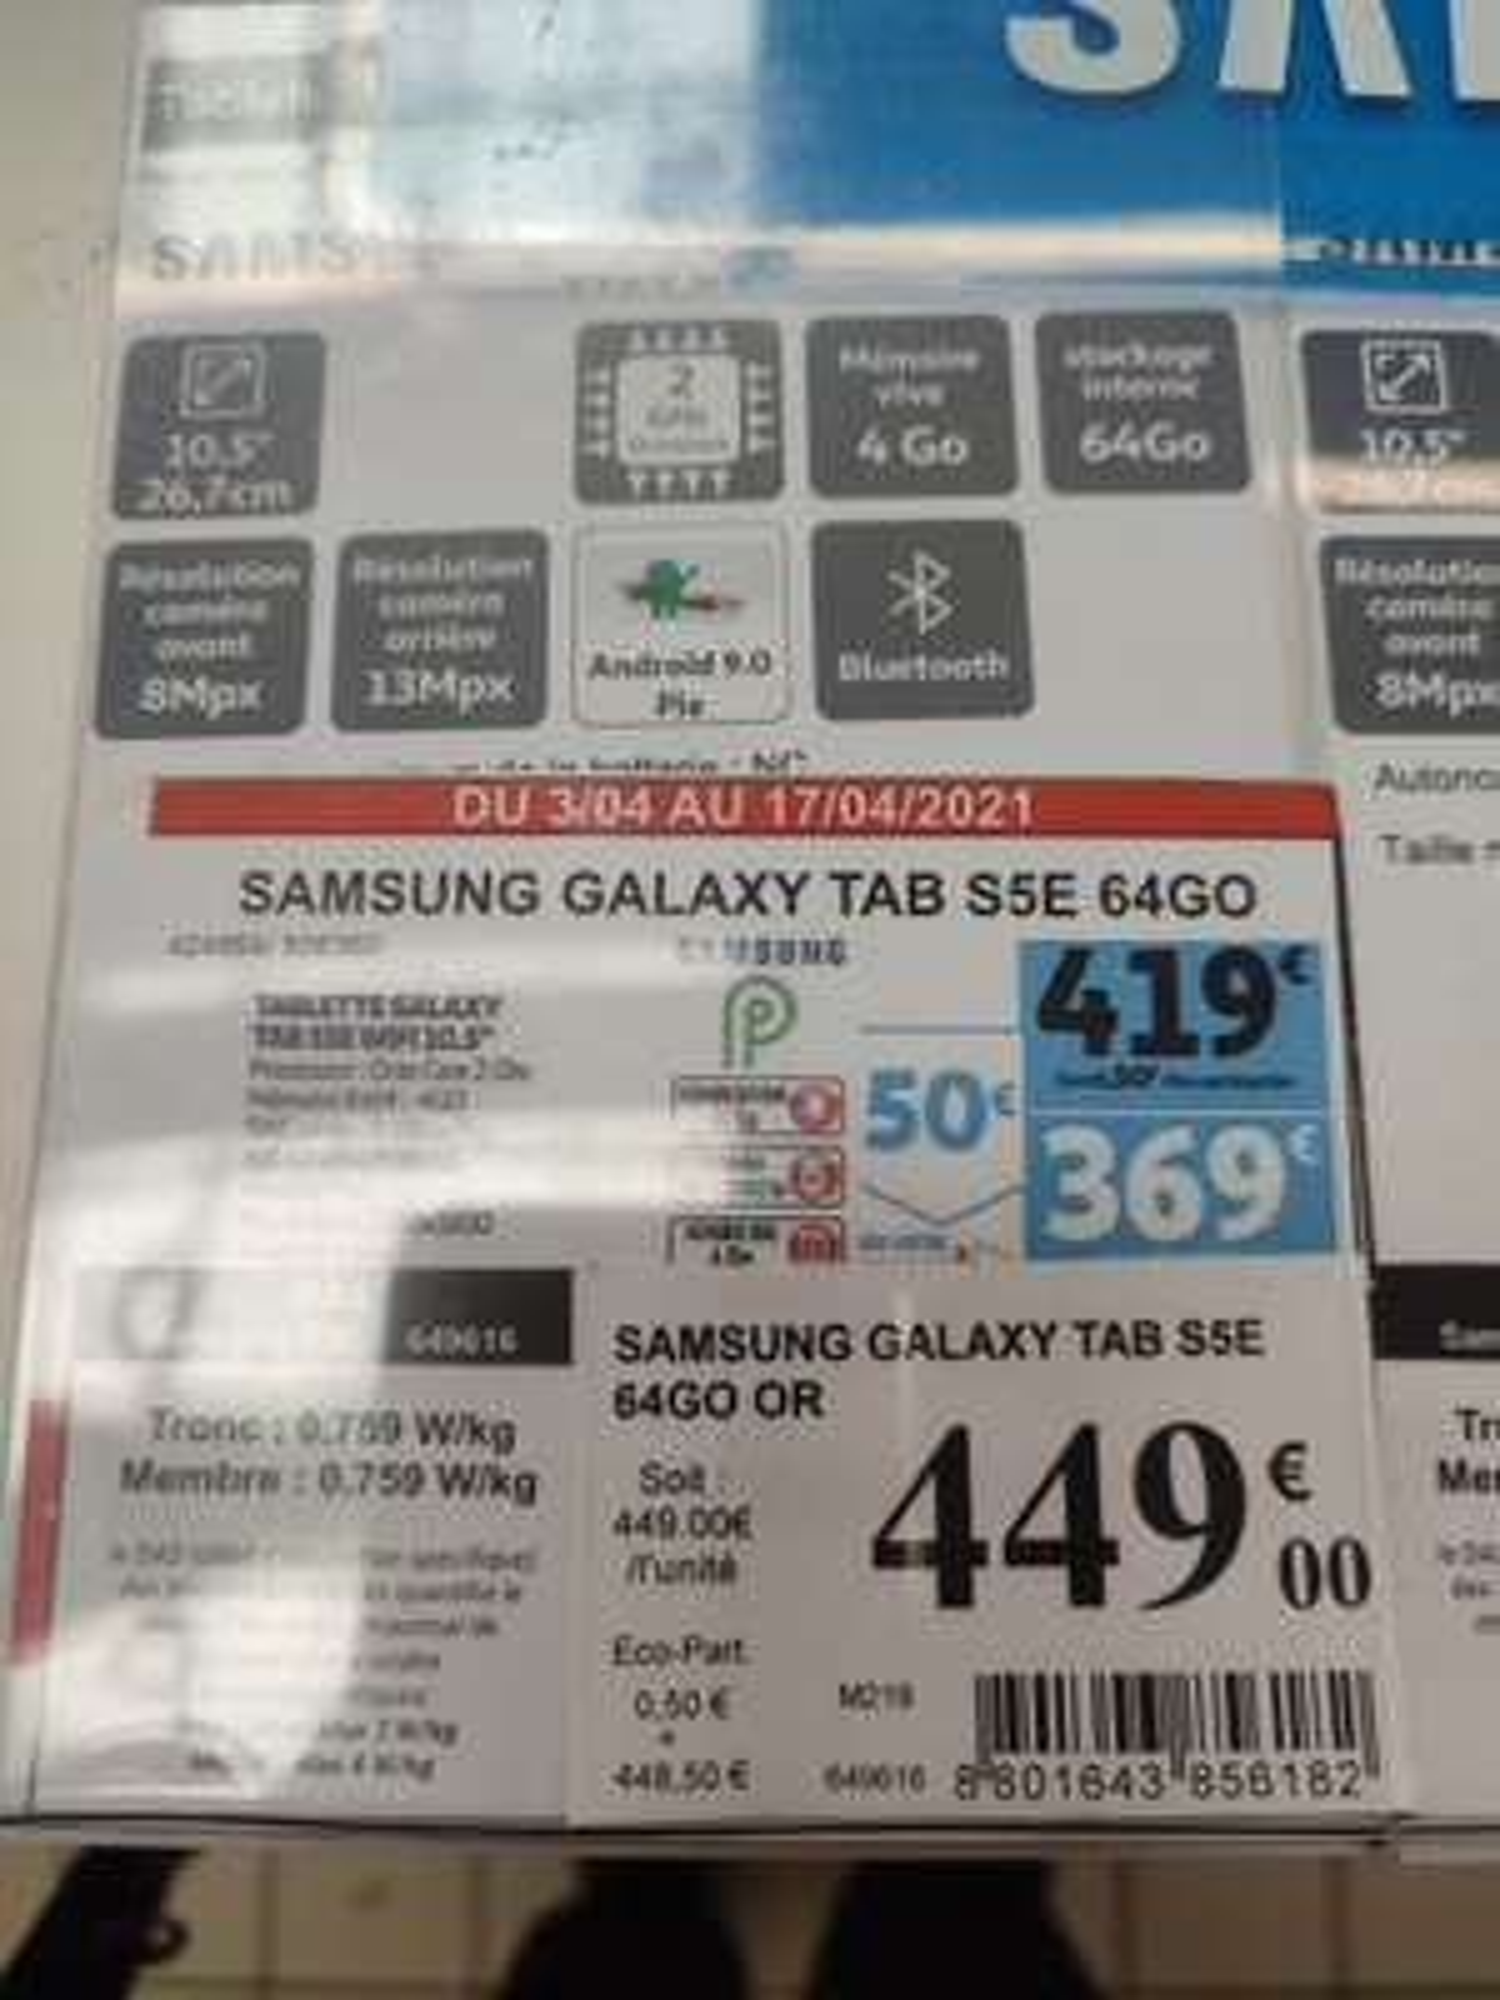 "Tablette tactile 10.5"" Samsung Galaxy Tab S5e - WQHD+, SnapDragon 670, 4 Go RAM, 64 Go, Android 9.0 (via 50€ en fidélité) - Vedène (84)"